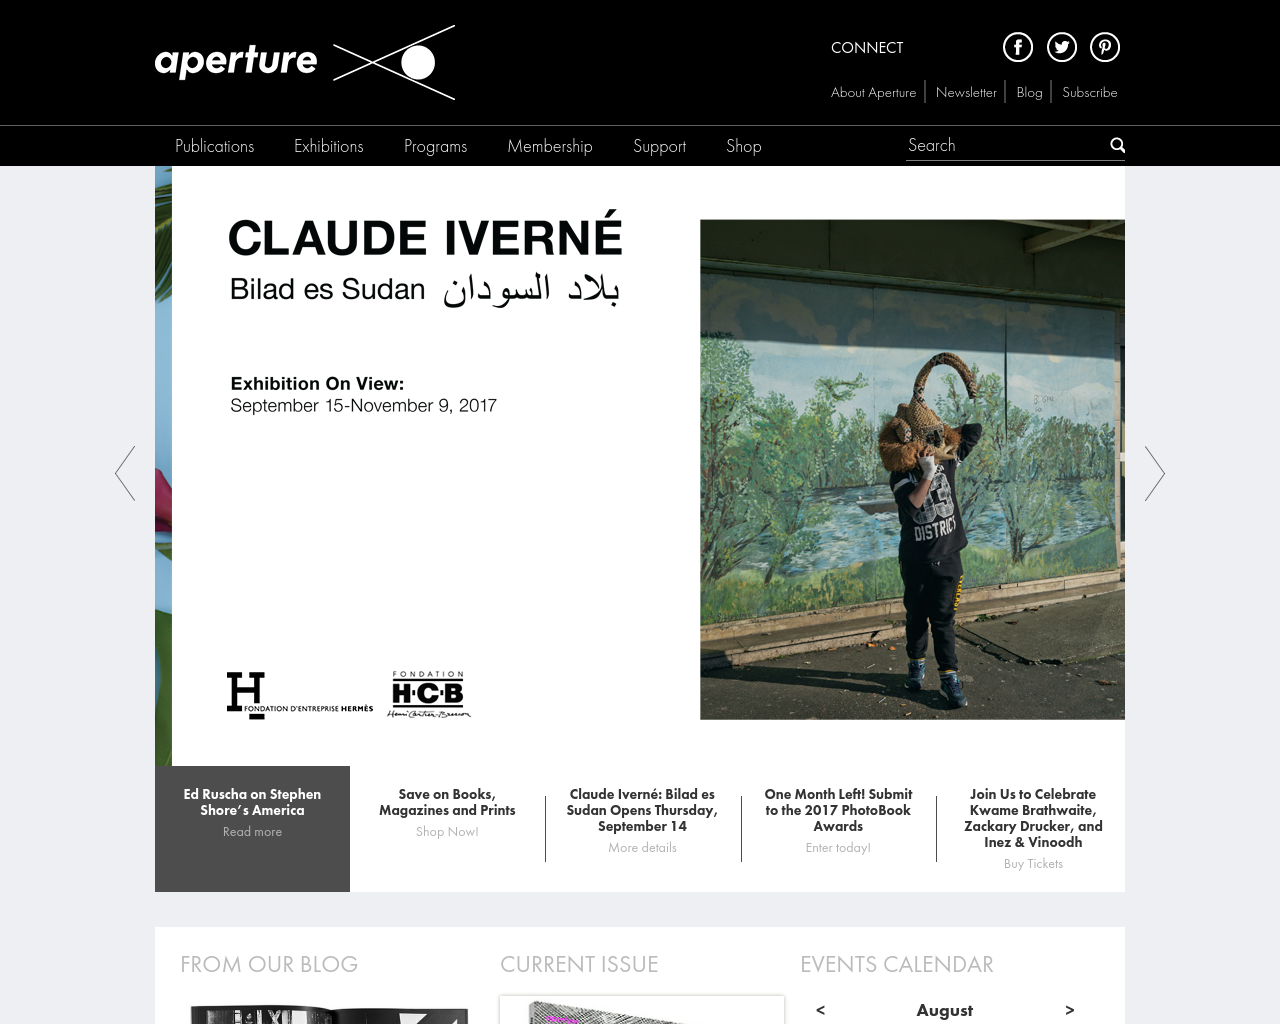 Aperture-Advertising-Reviews-Pricing